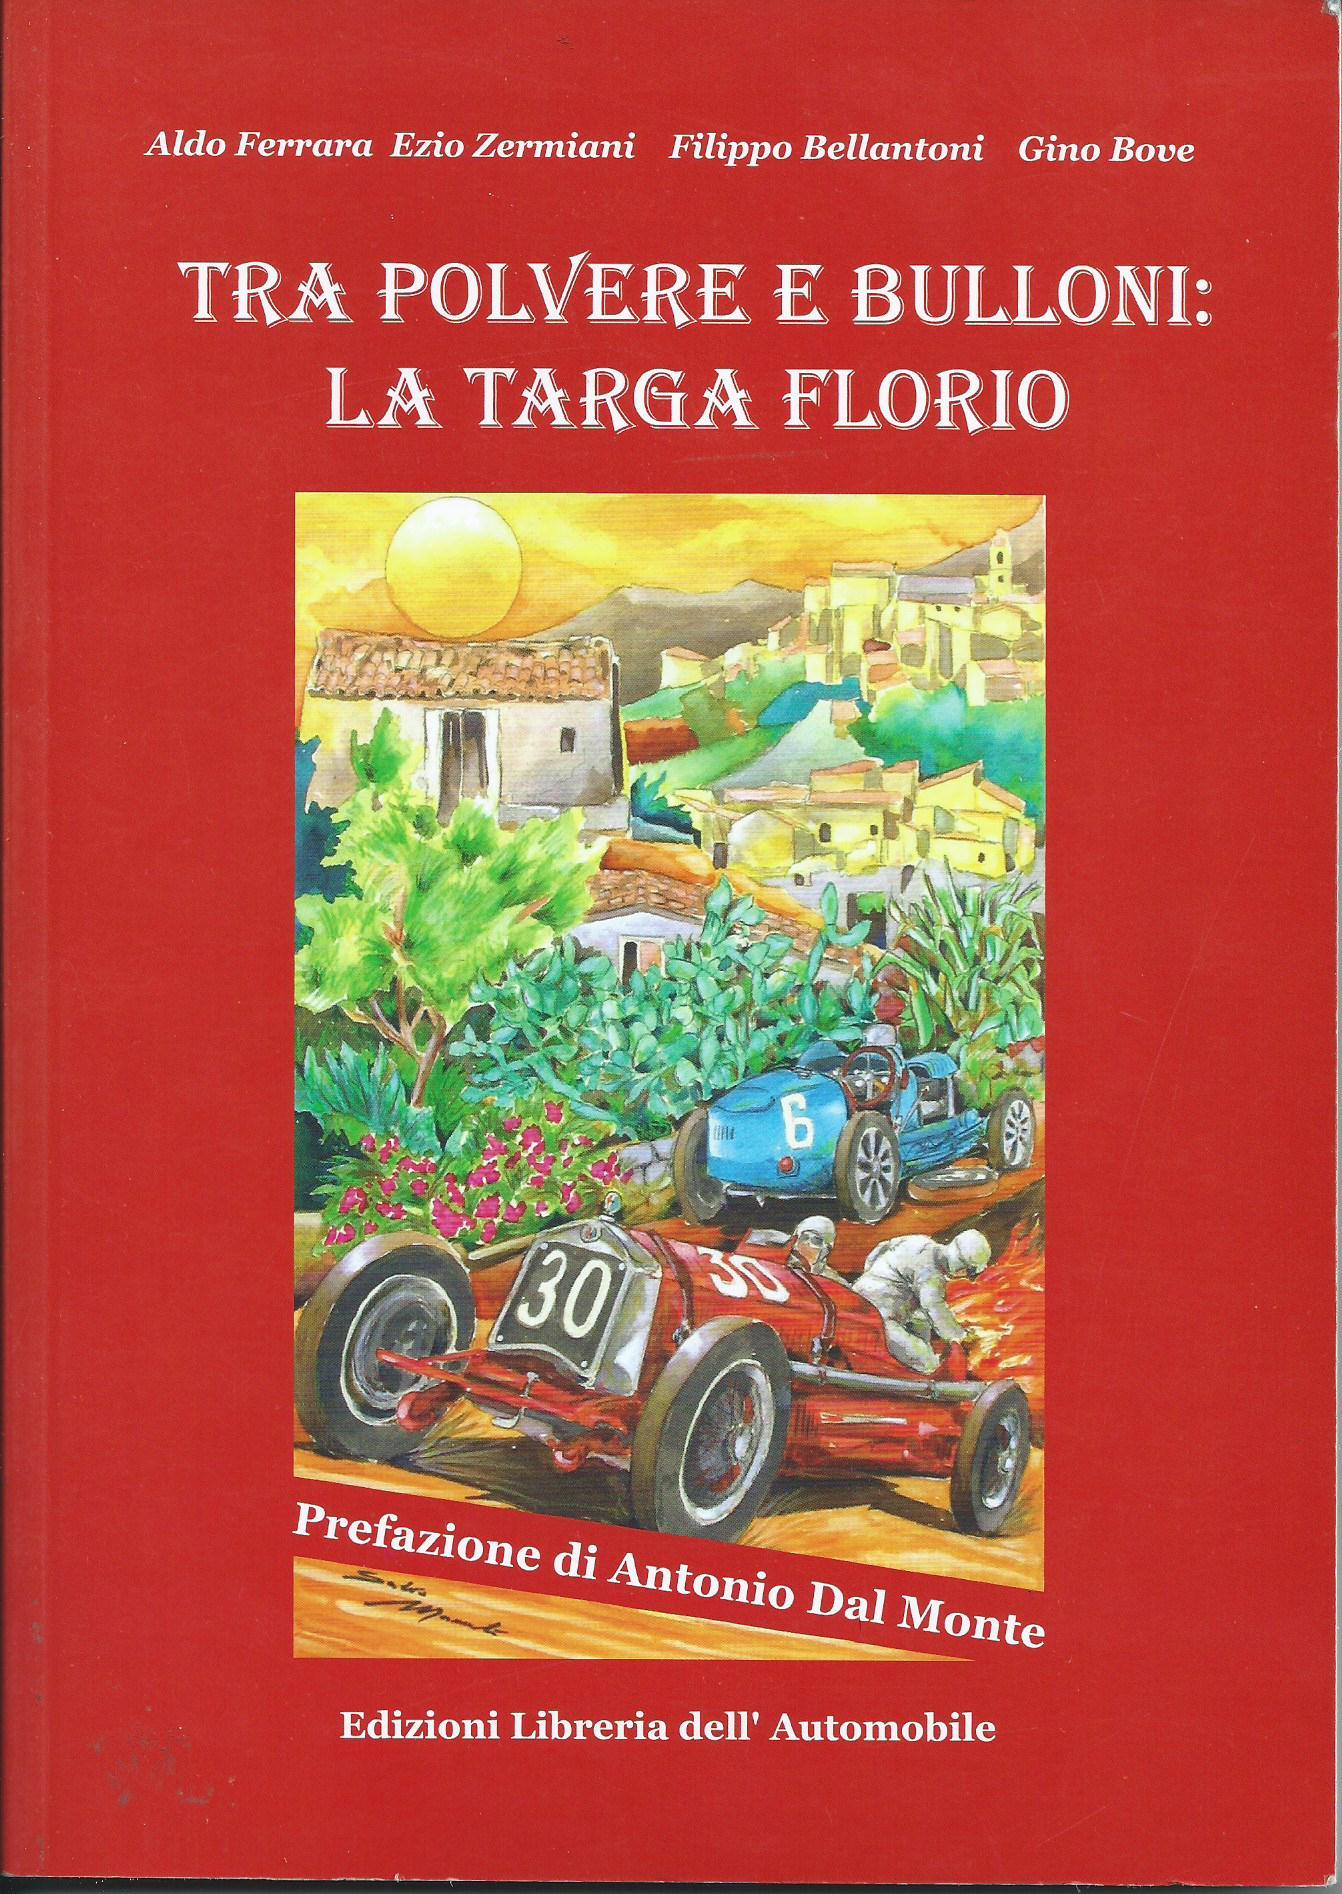 Tra polvere e bulloni: la Targa Florio